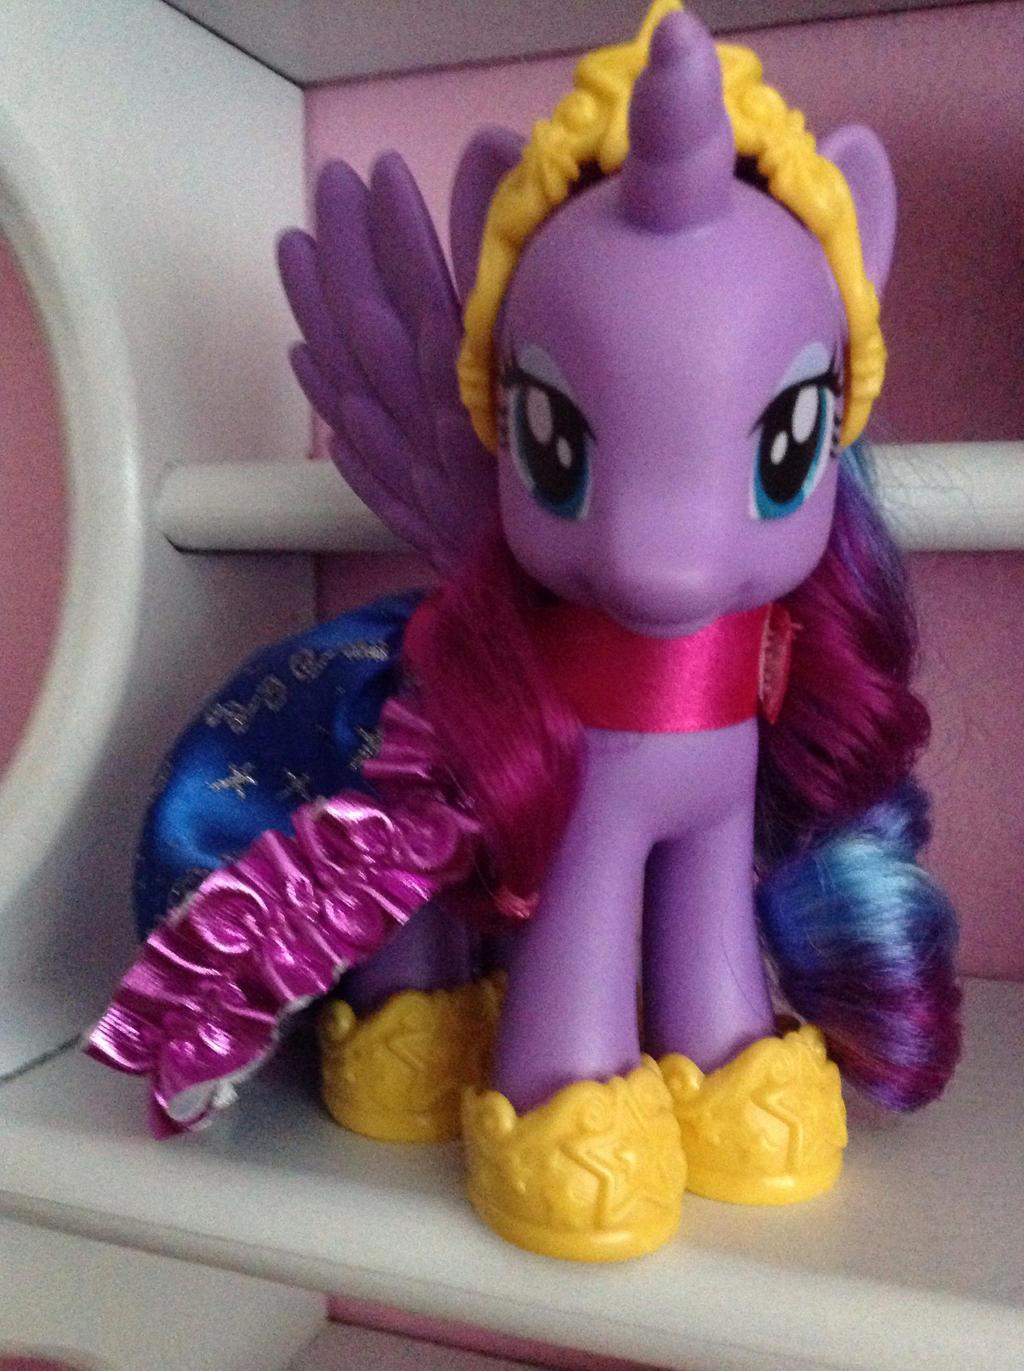 Princess Luna Fashion Doll By Squeakynoodle On Deviantart